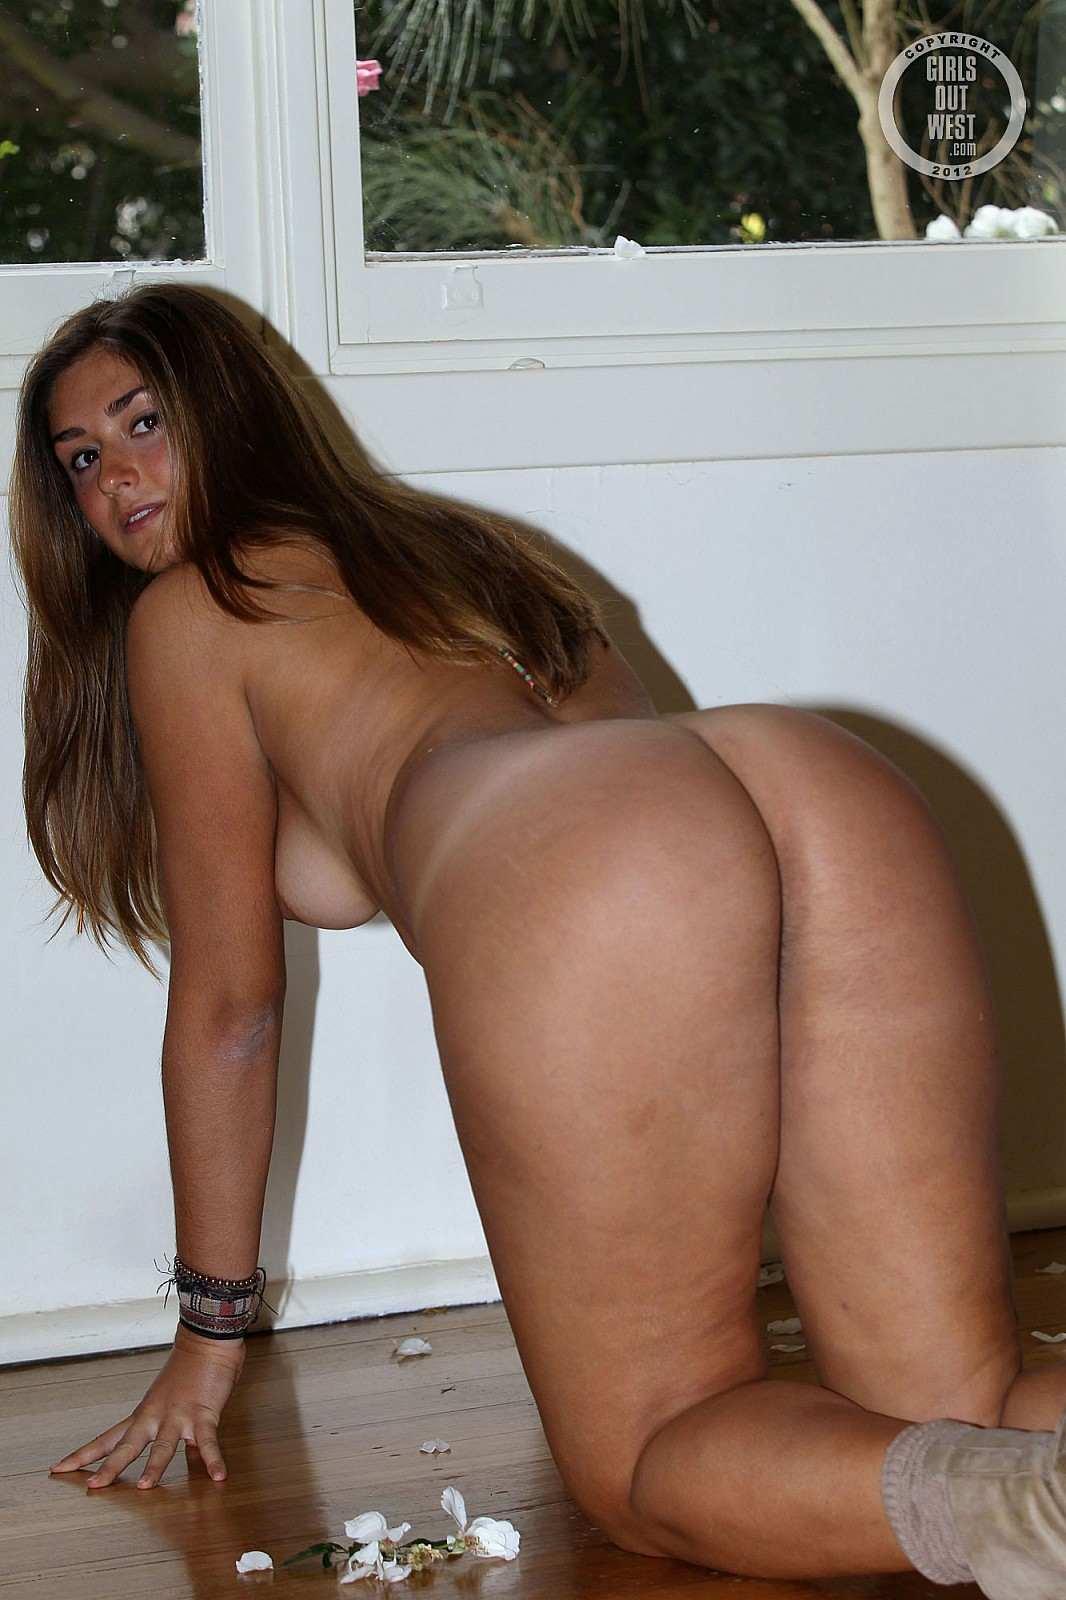 australian-nude-girl-pic